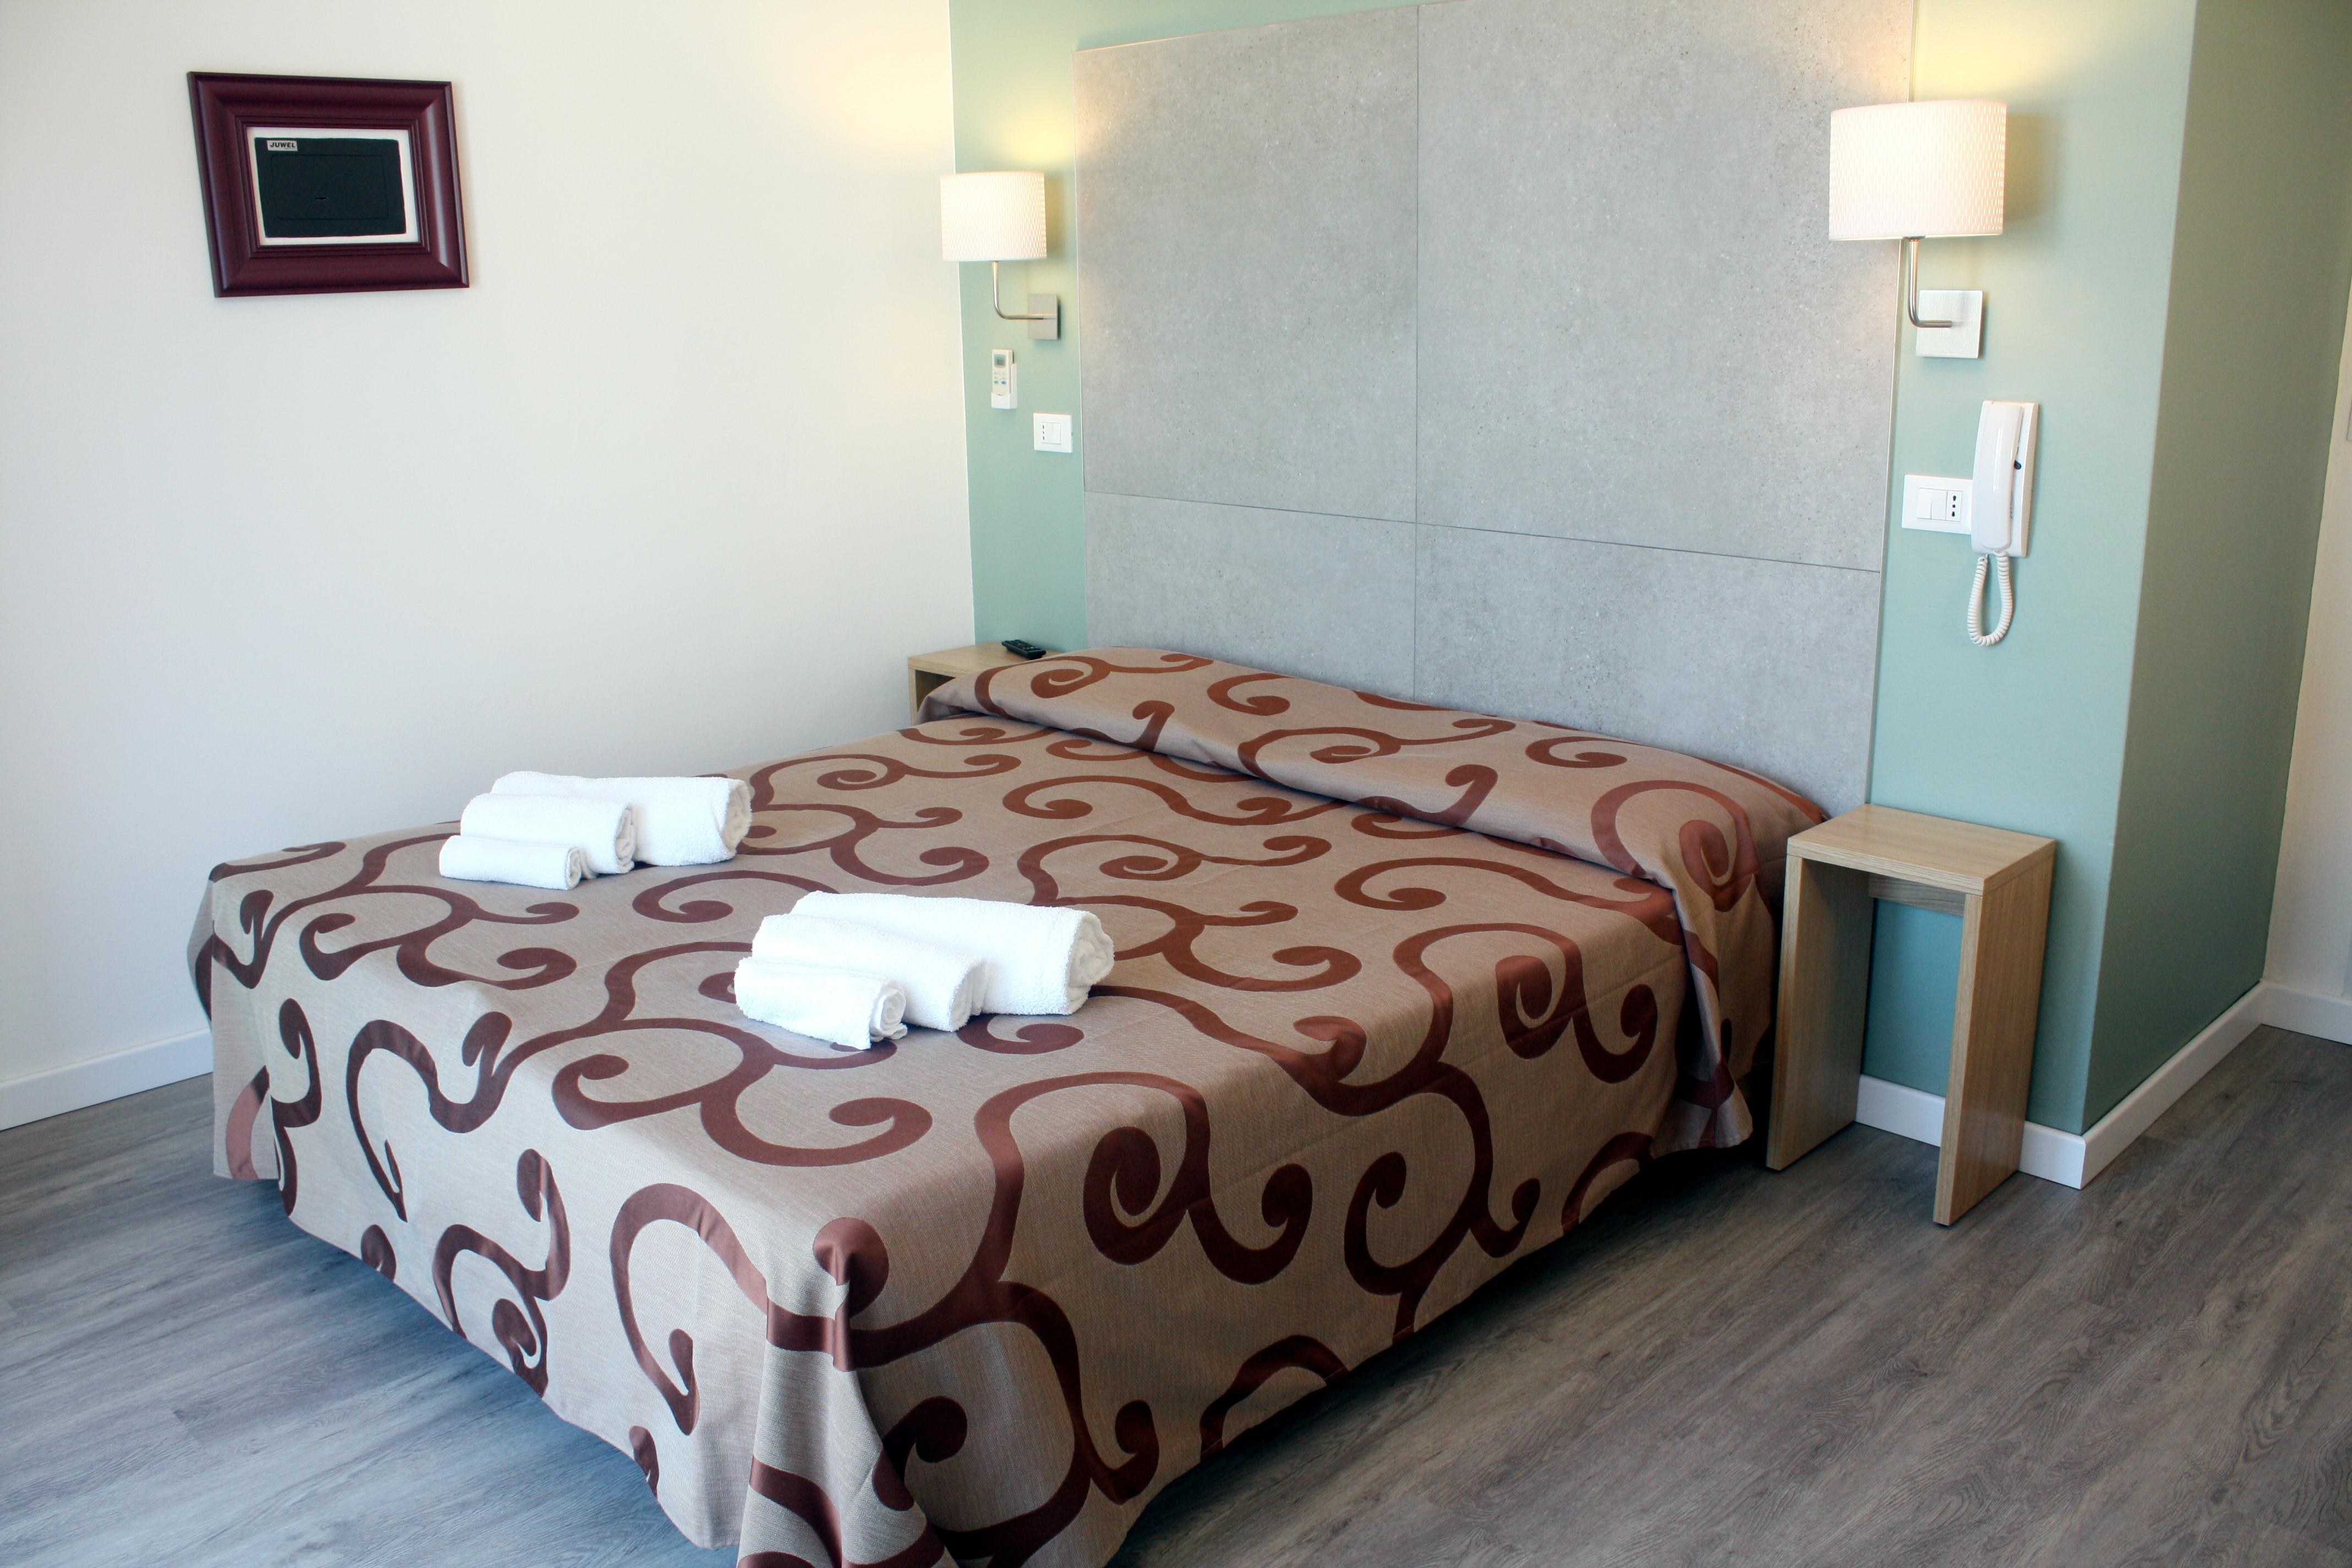 http://www.hotelhelgacaorle.com/wp-content/uploads/2019/05/smart16.jpg